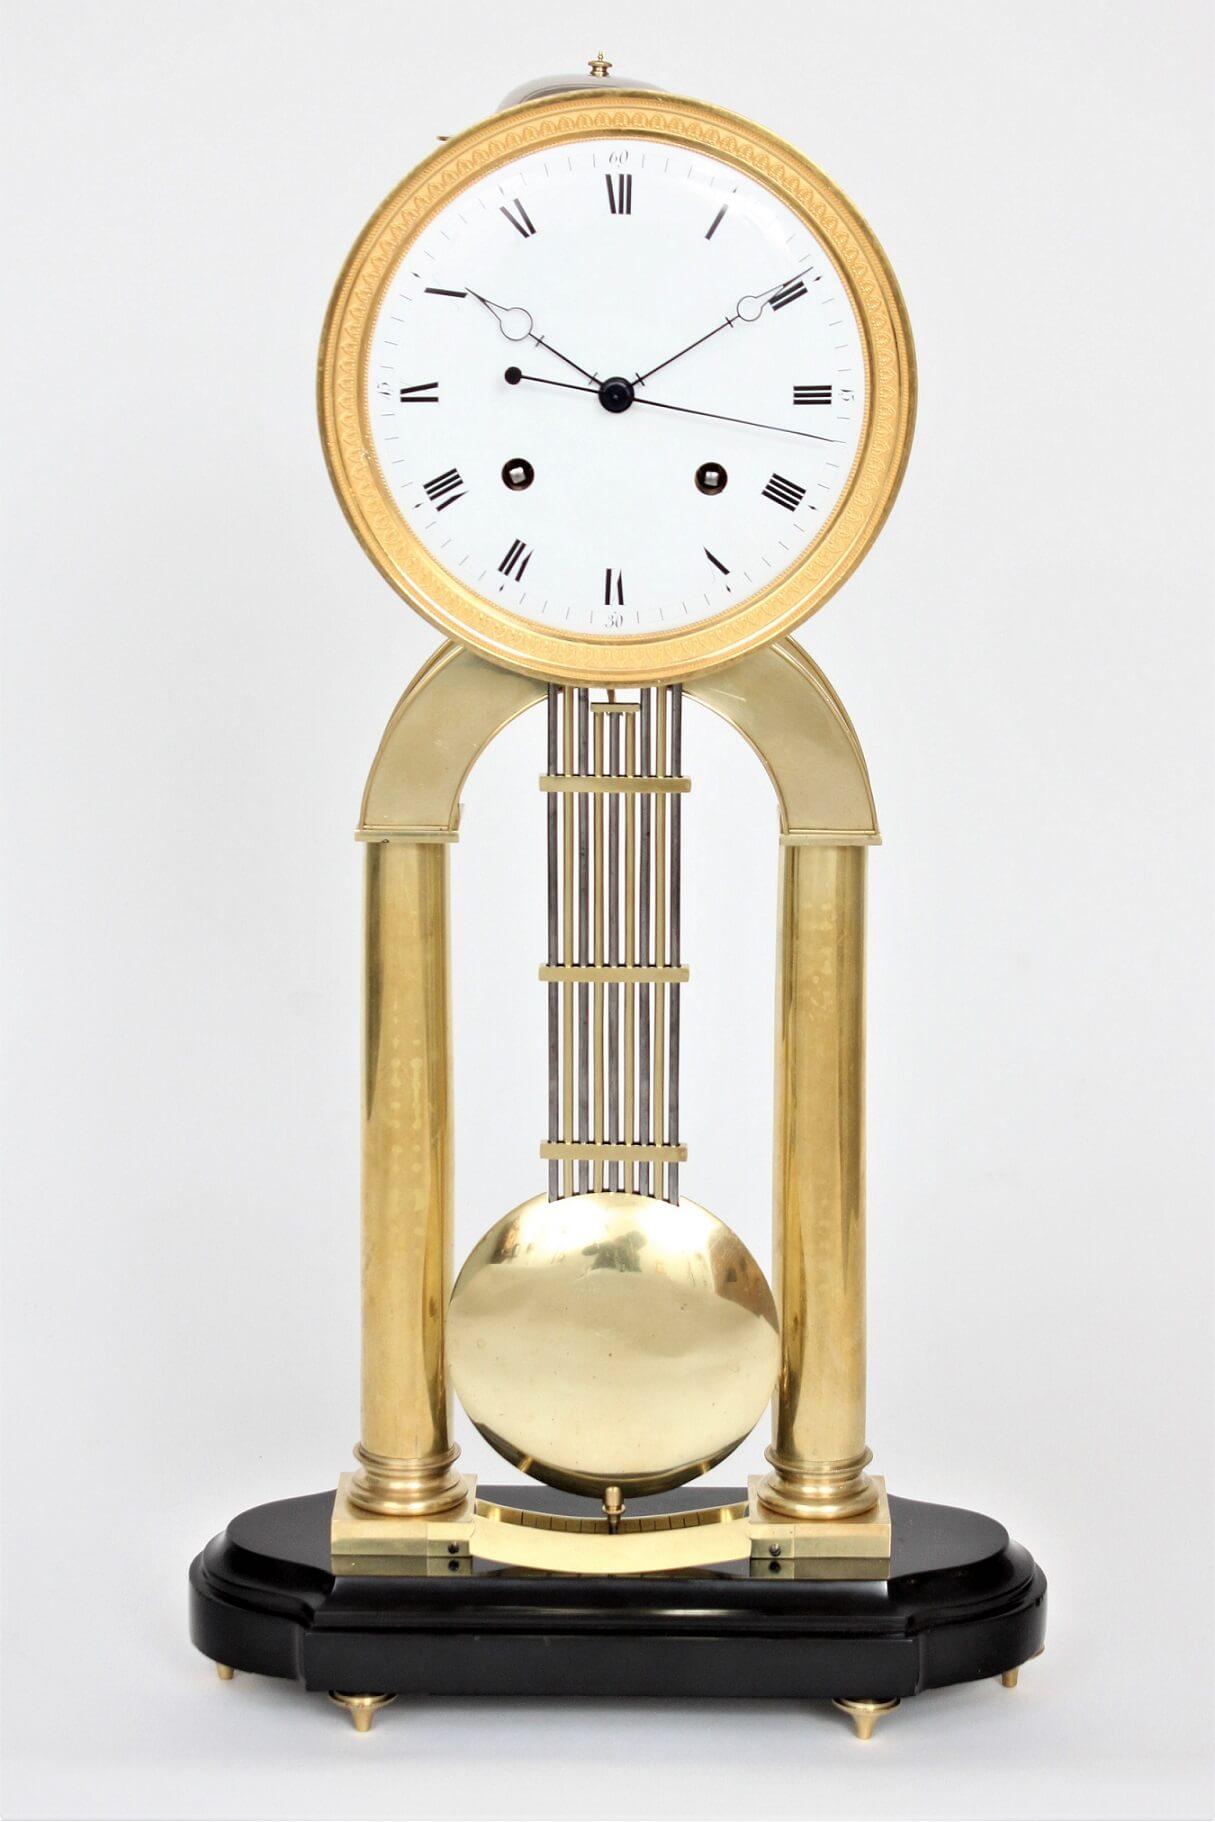 Belgian-French-ormolu-brass-skeleton-regulator-striking-marble-precision-antique-clock-sarton-liege-luik-